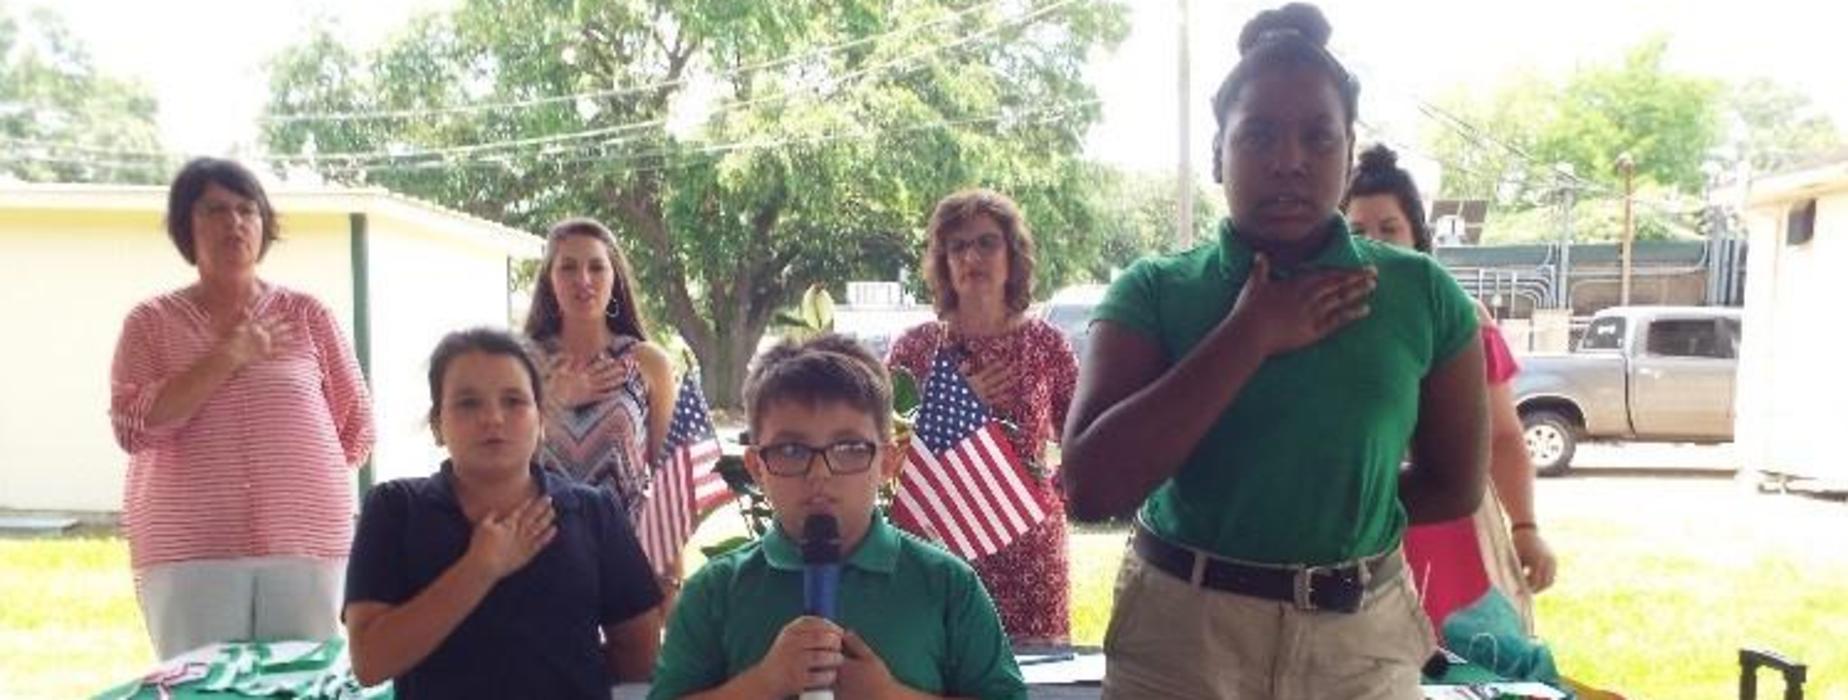 3rd grade pledge